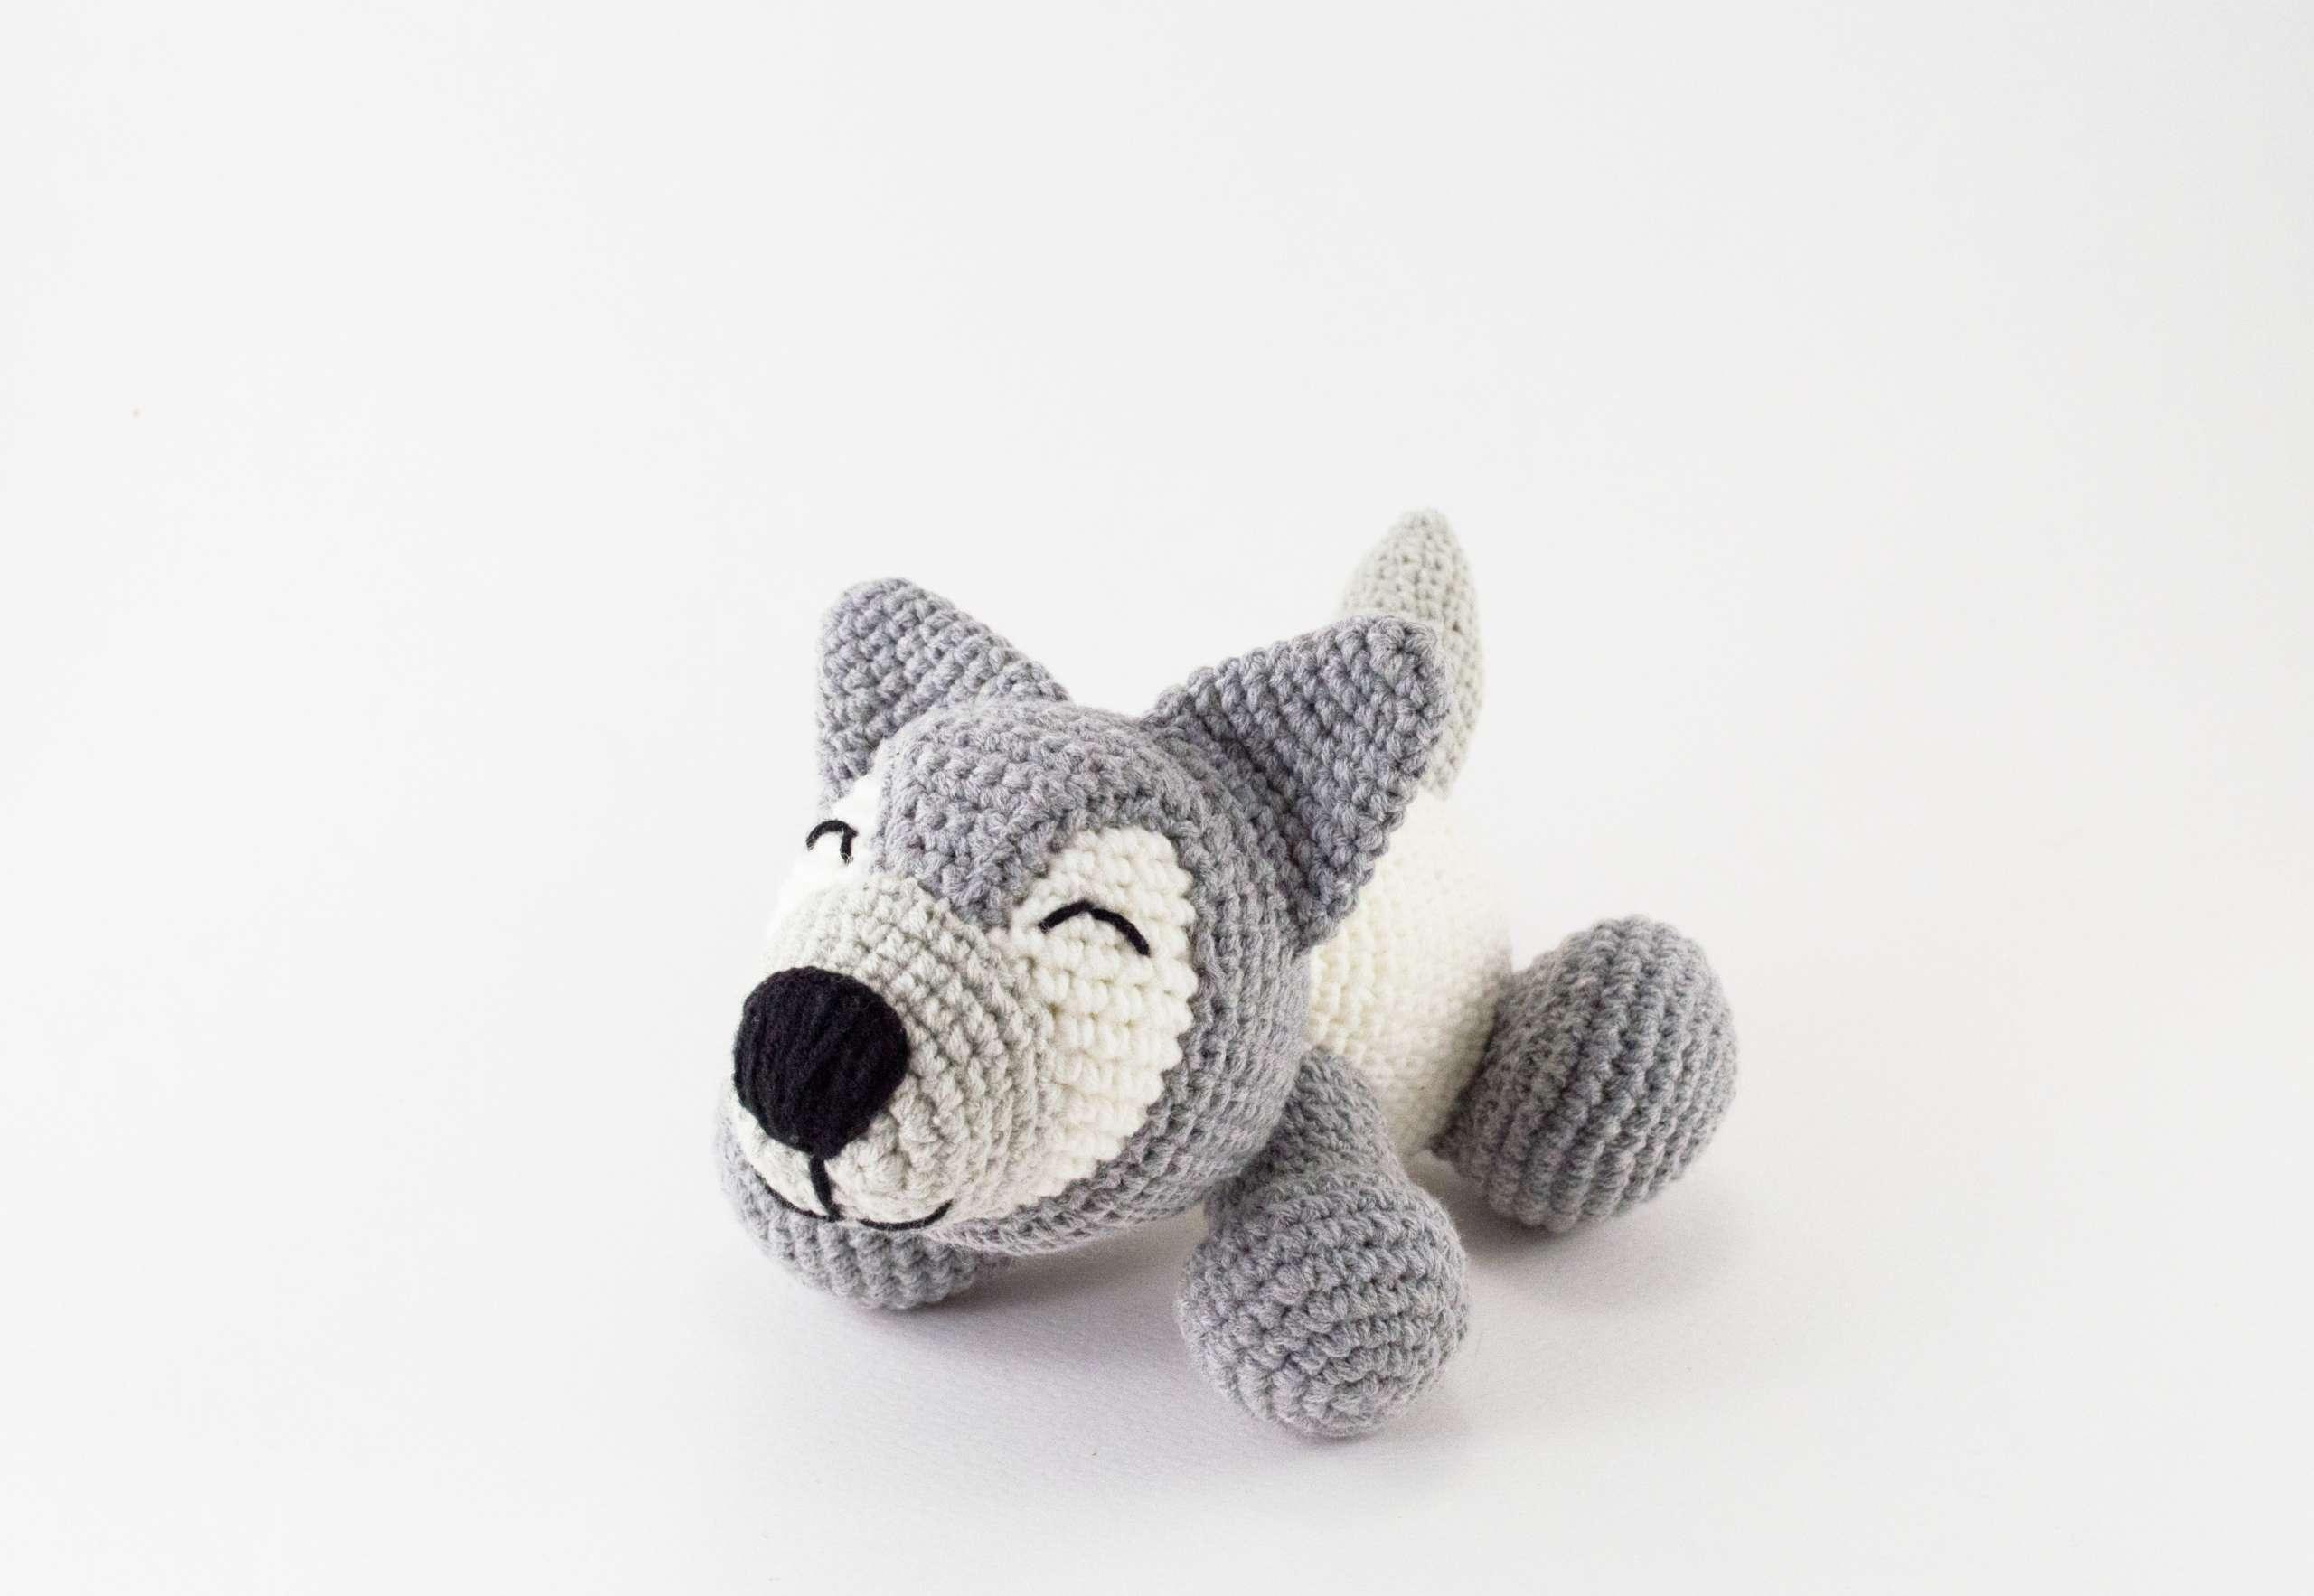 crochet husky dog toy